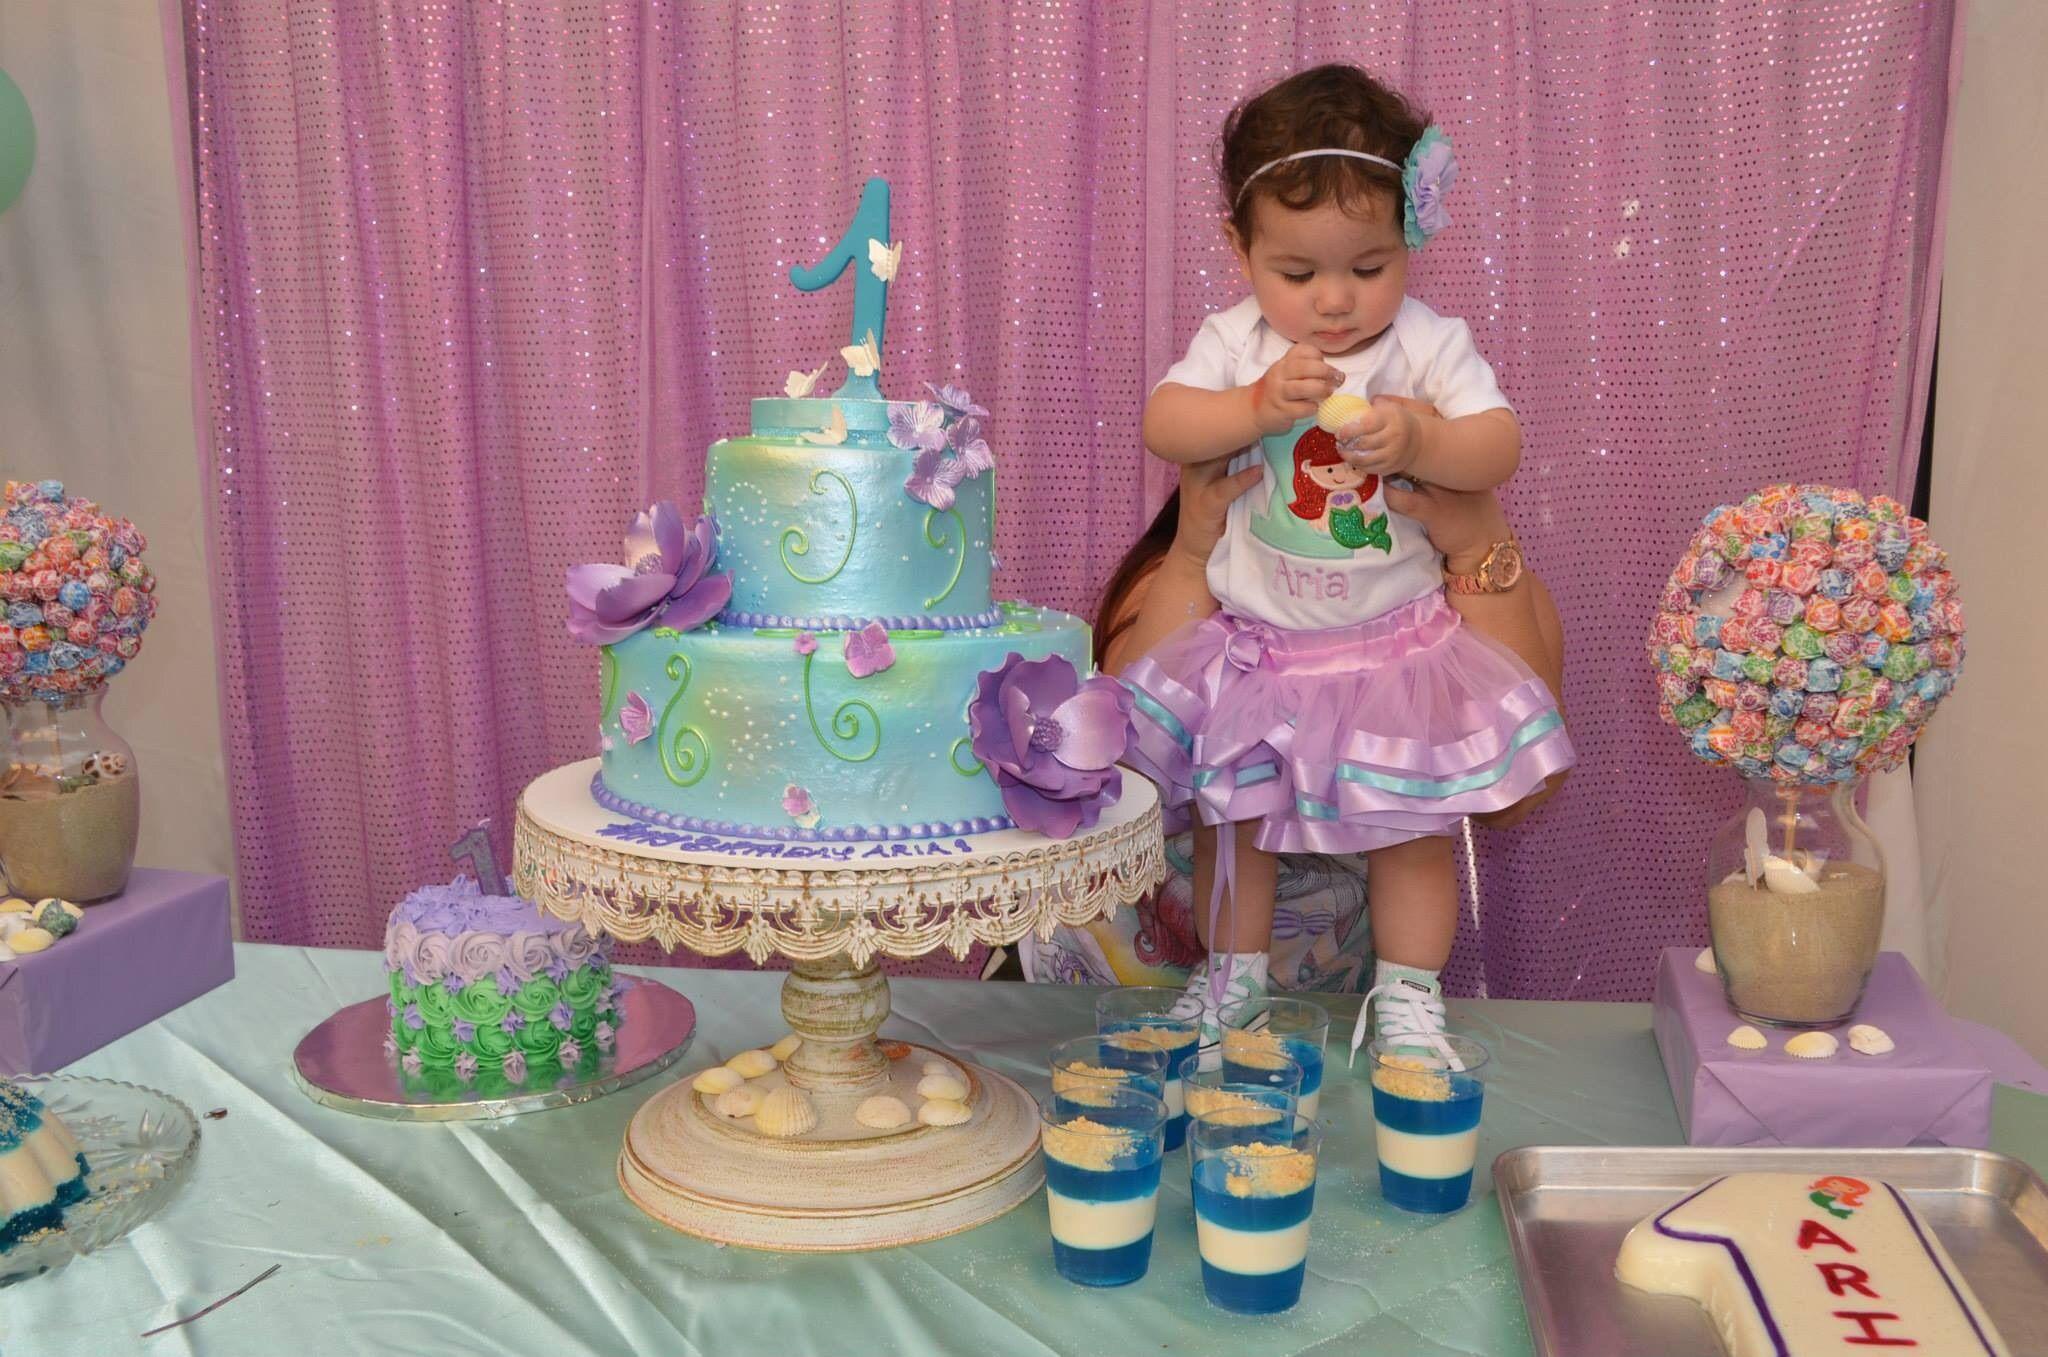 Bday girl Aria turning 1 9714 Mermaid theme 1st Birthday Party